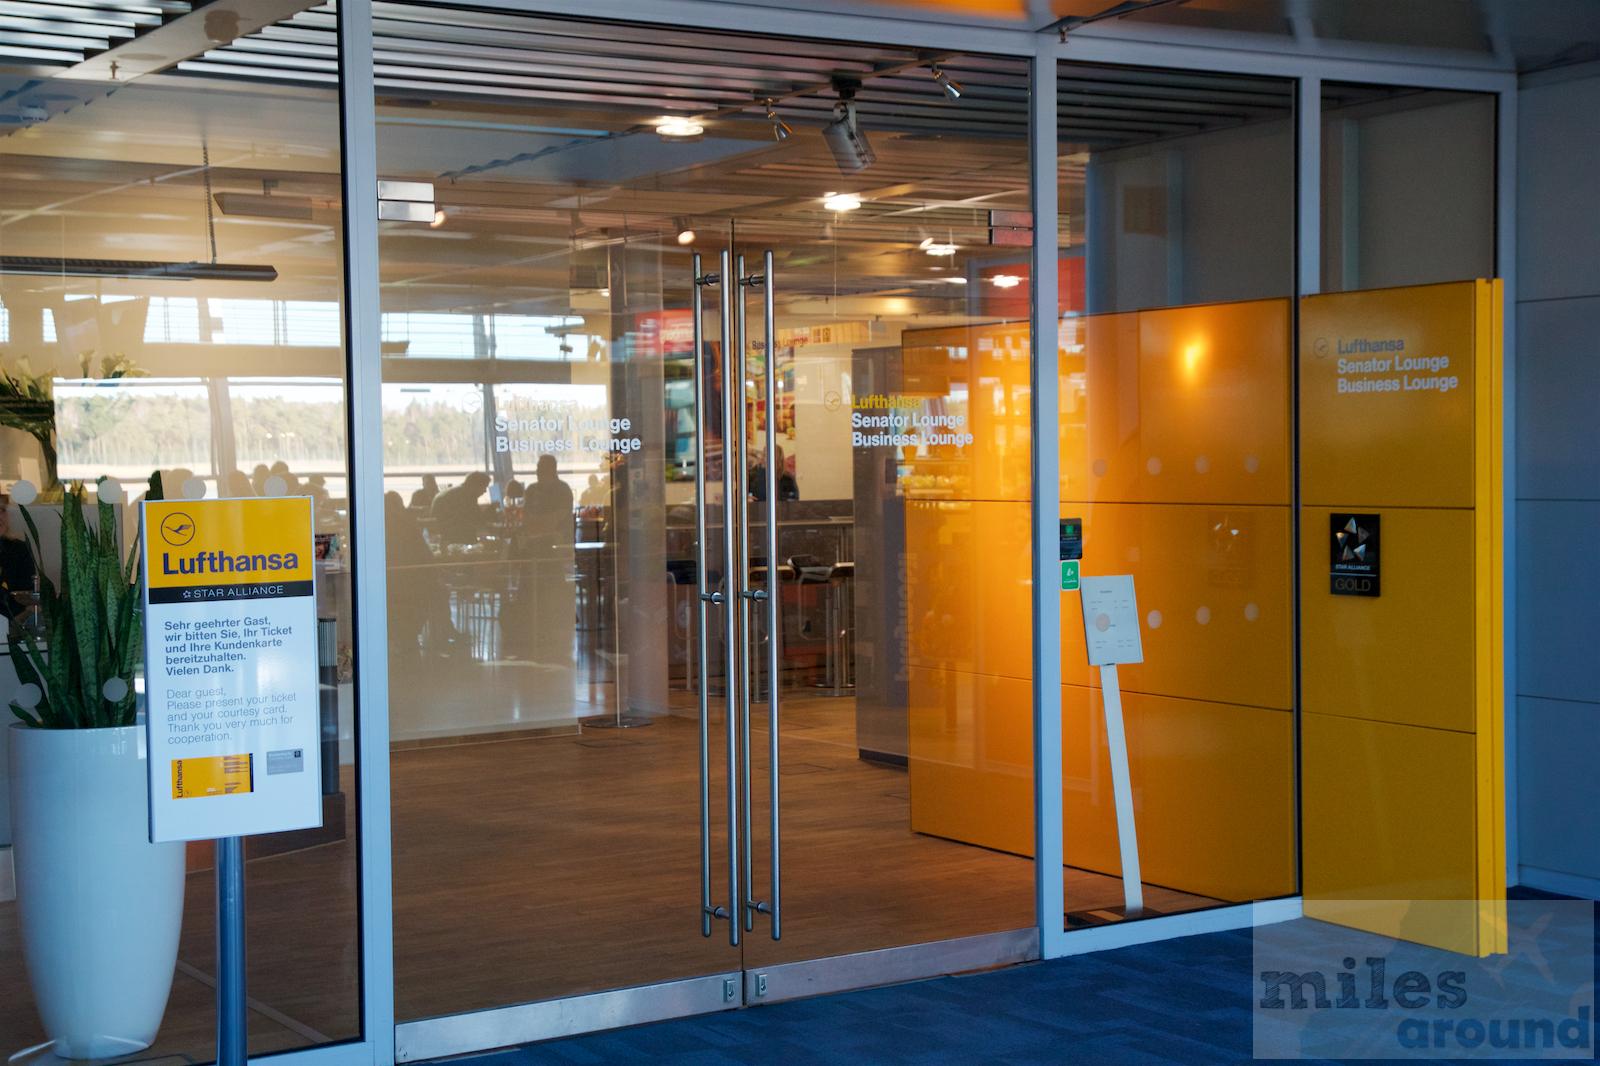 Lufthansa Senator Lounge At Nuremberg Airport (Lounge Review) inside Senator Inn &amp